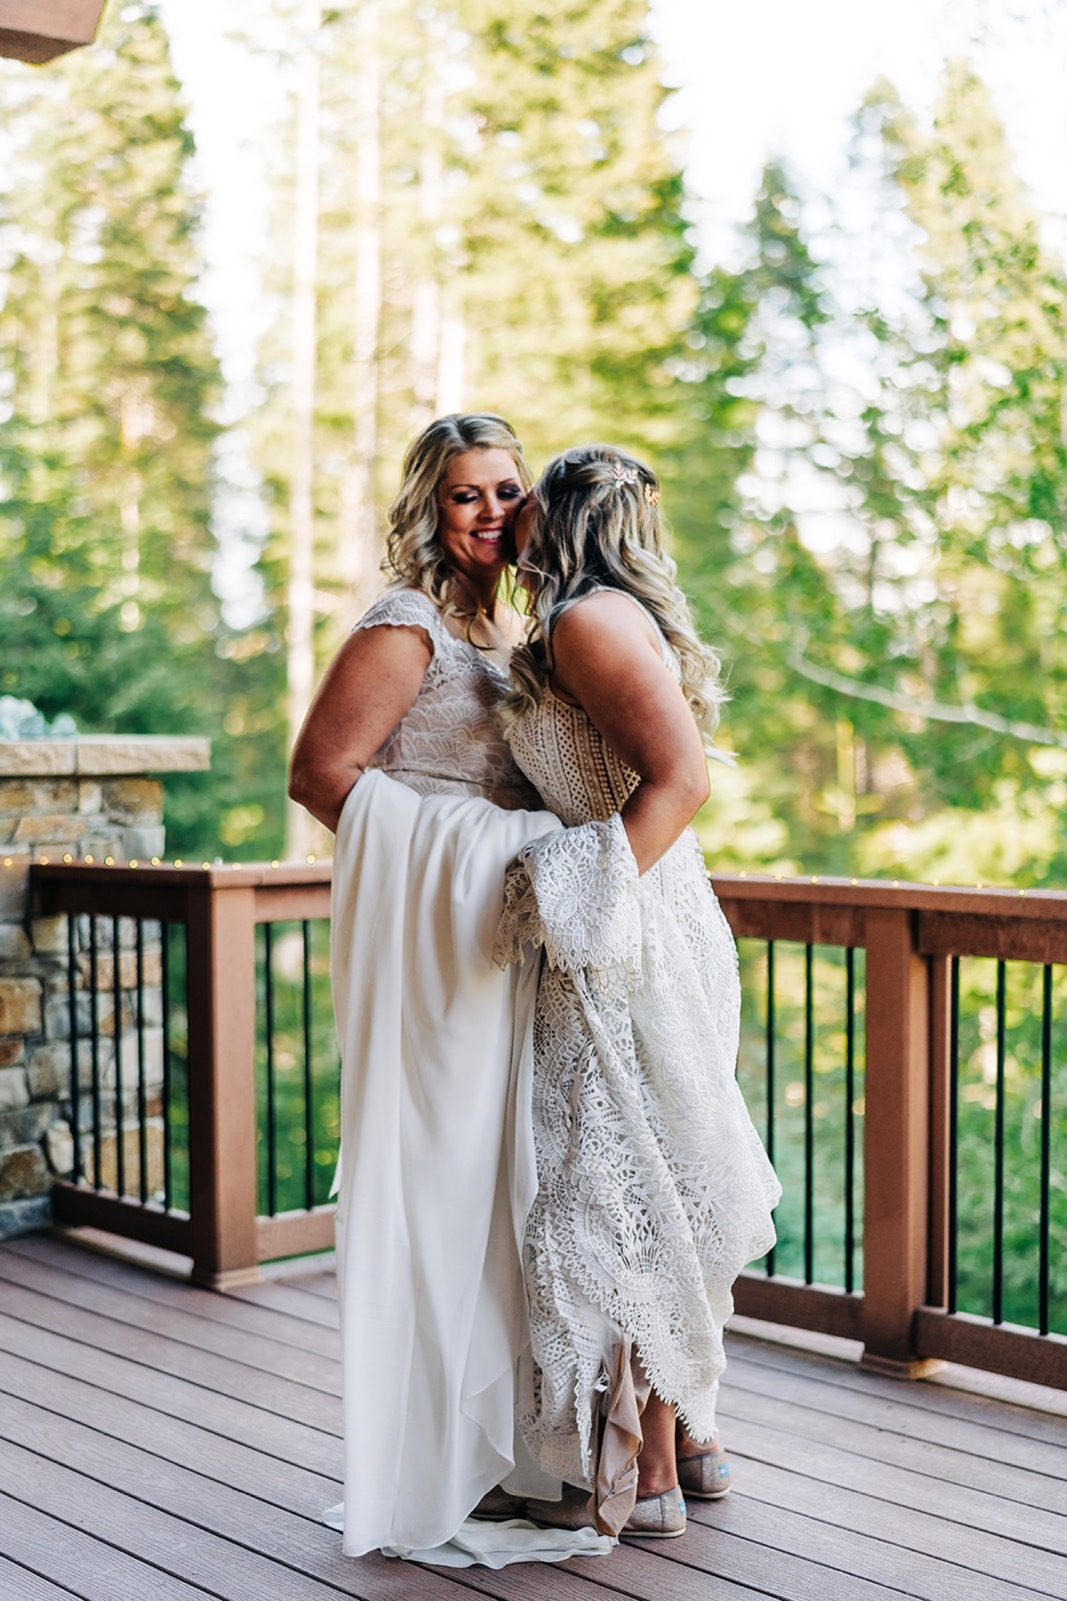 146_falissa_heather_wedding-451.jpg